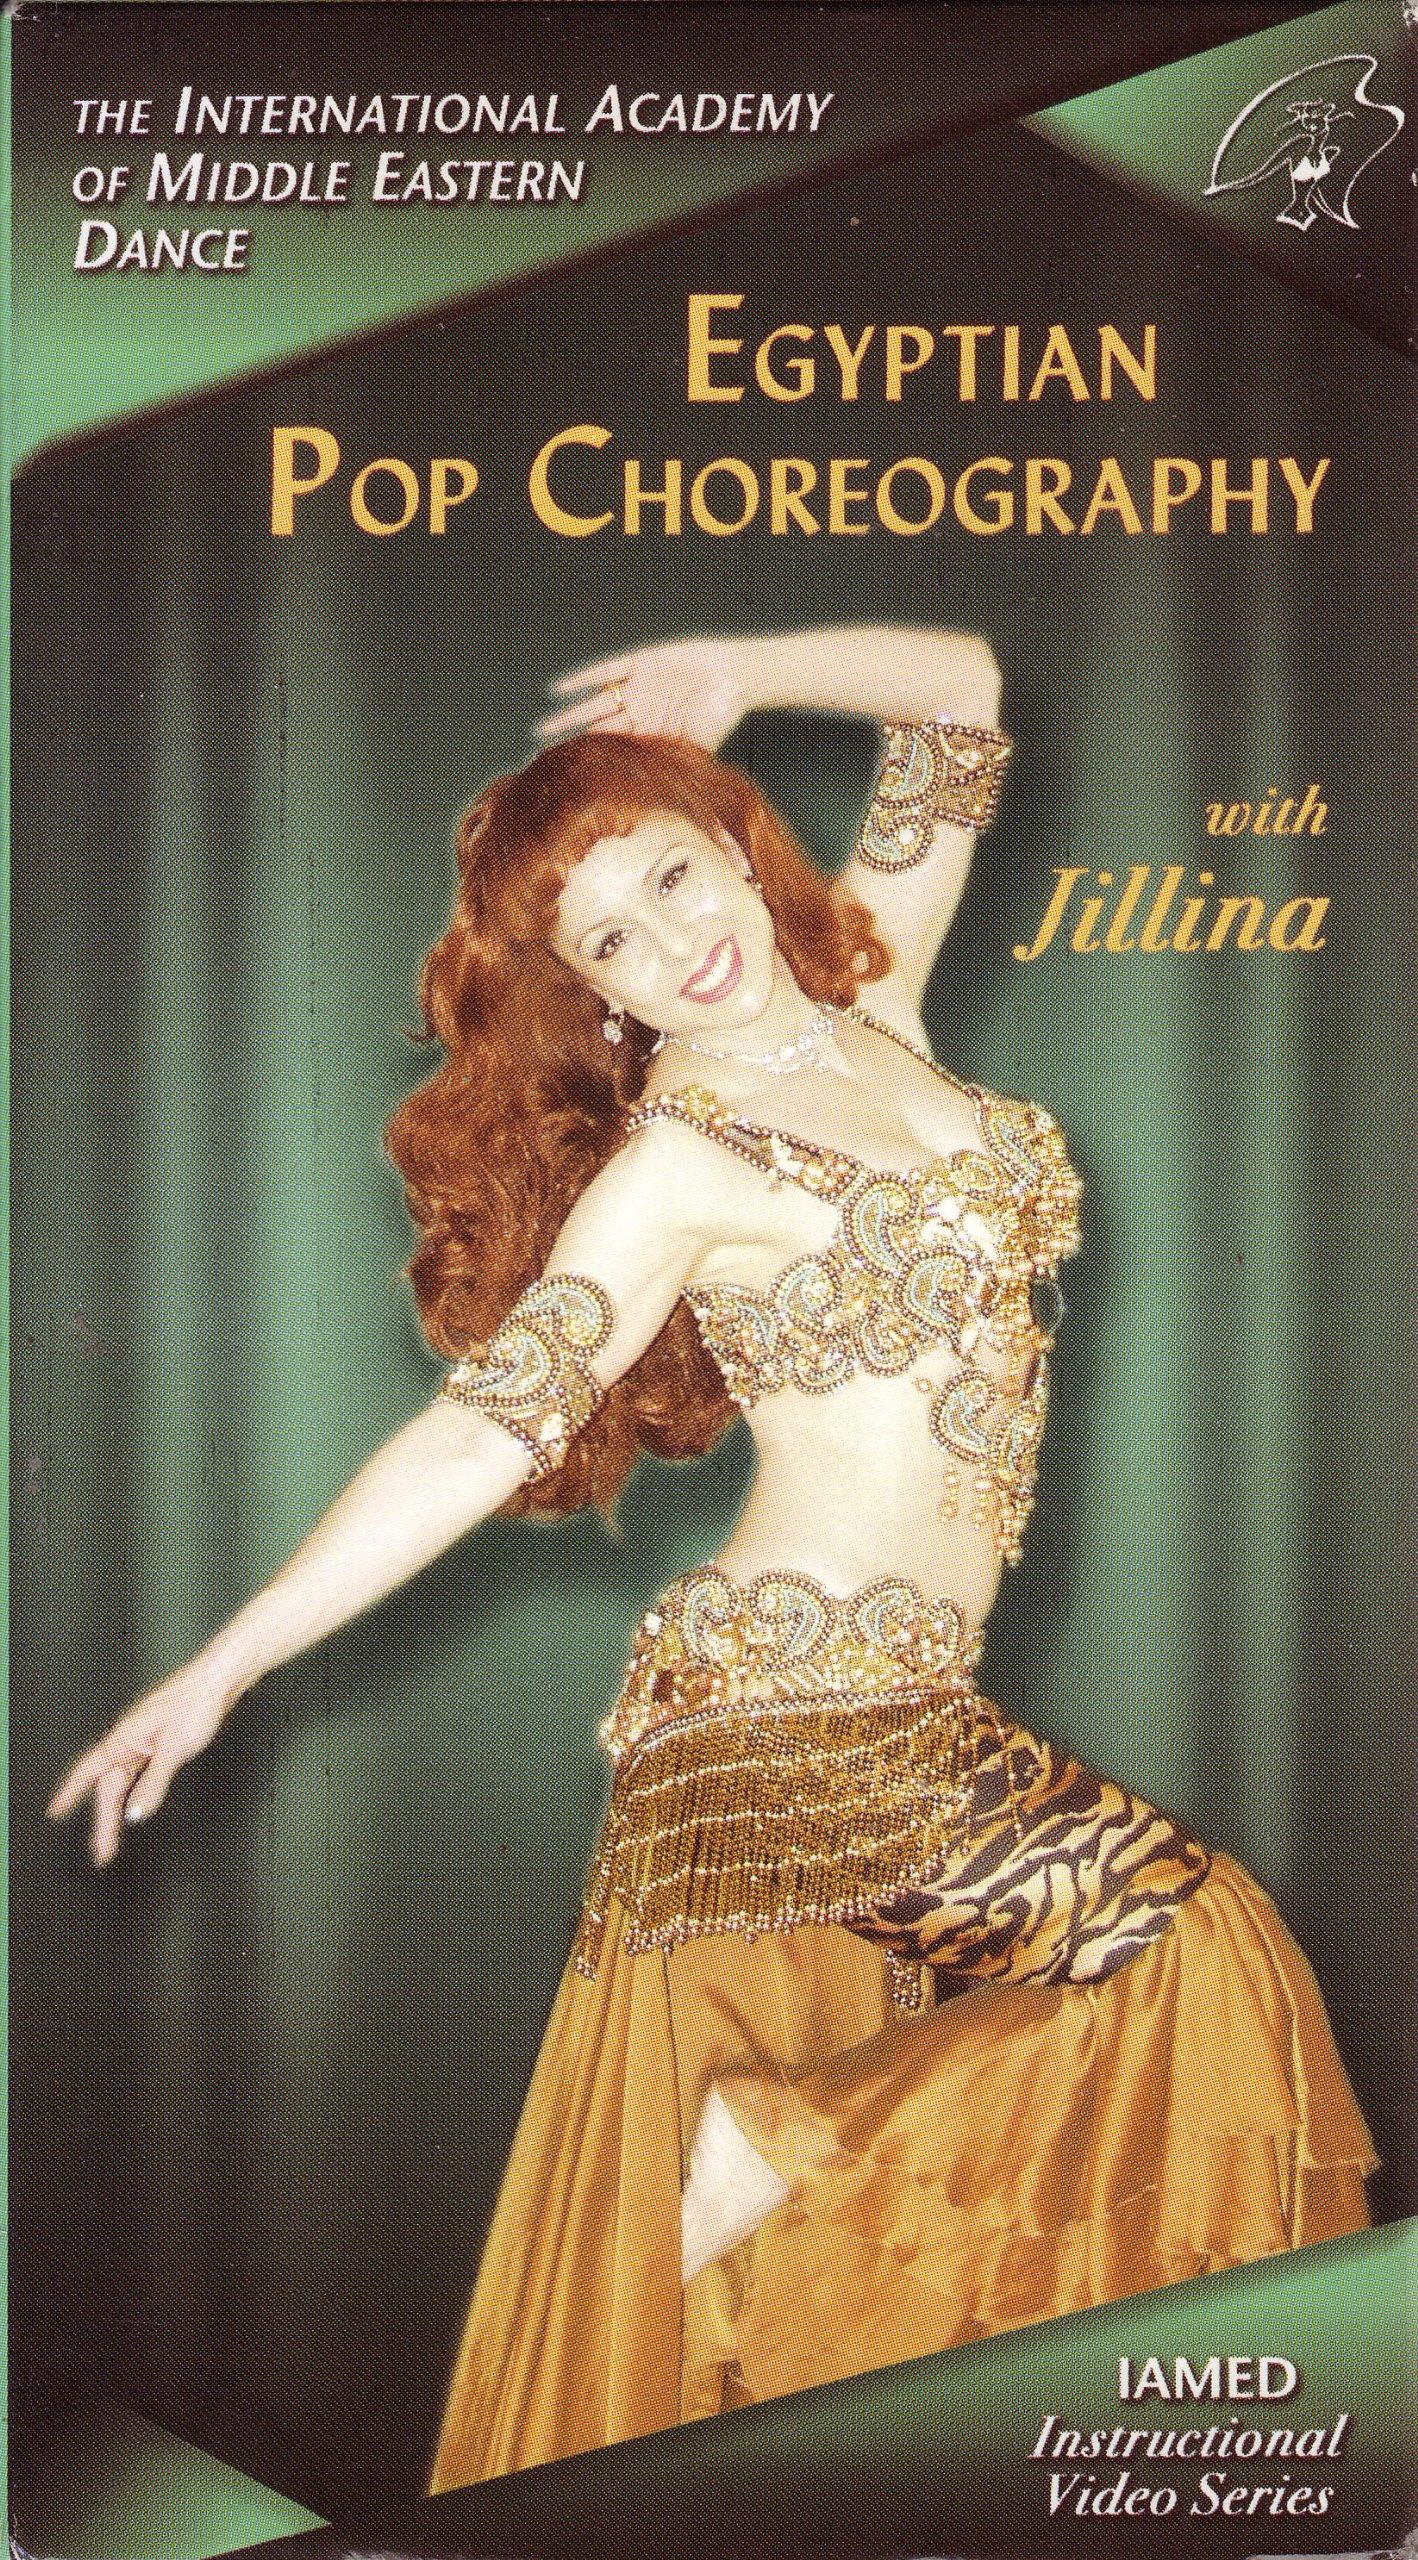 Egyptian Pop Choreography, Belly Dance Instructional Videotape [VHS]